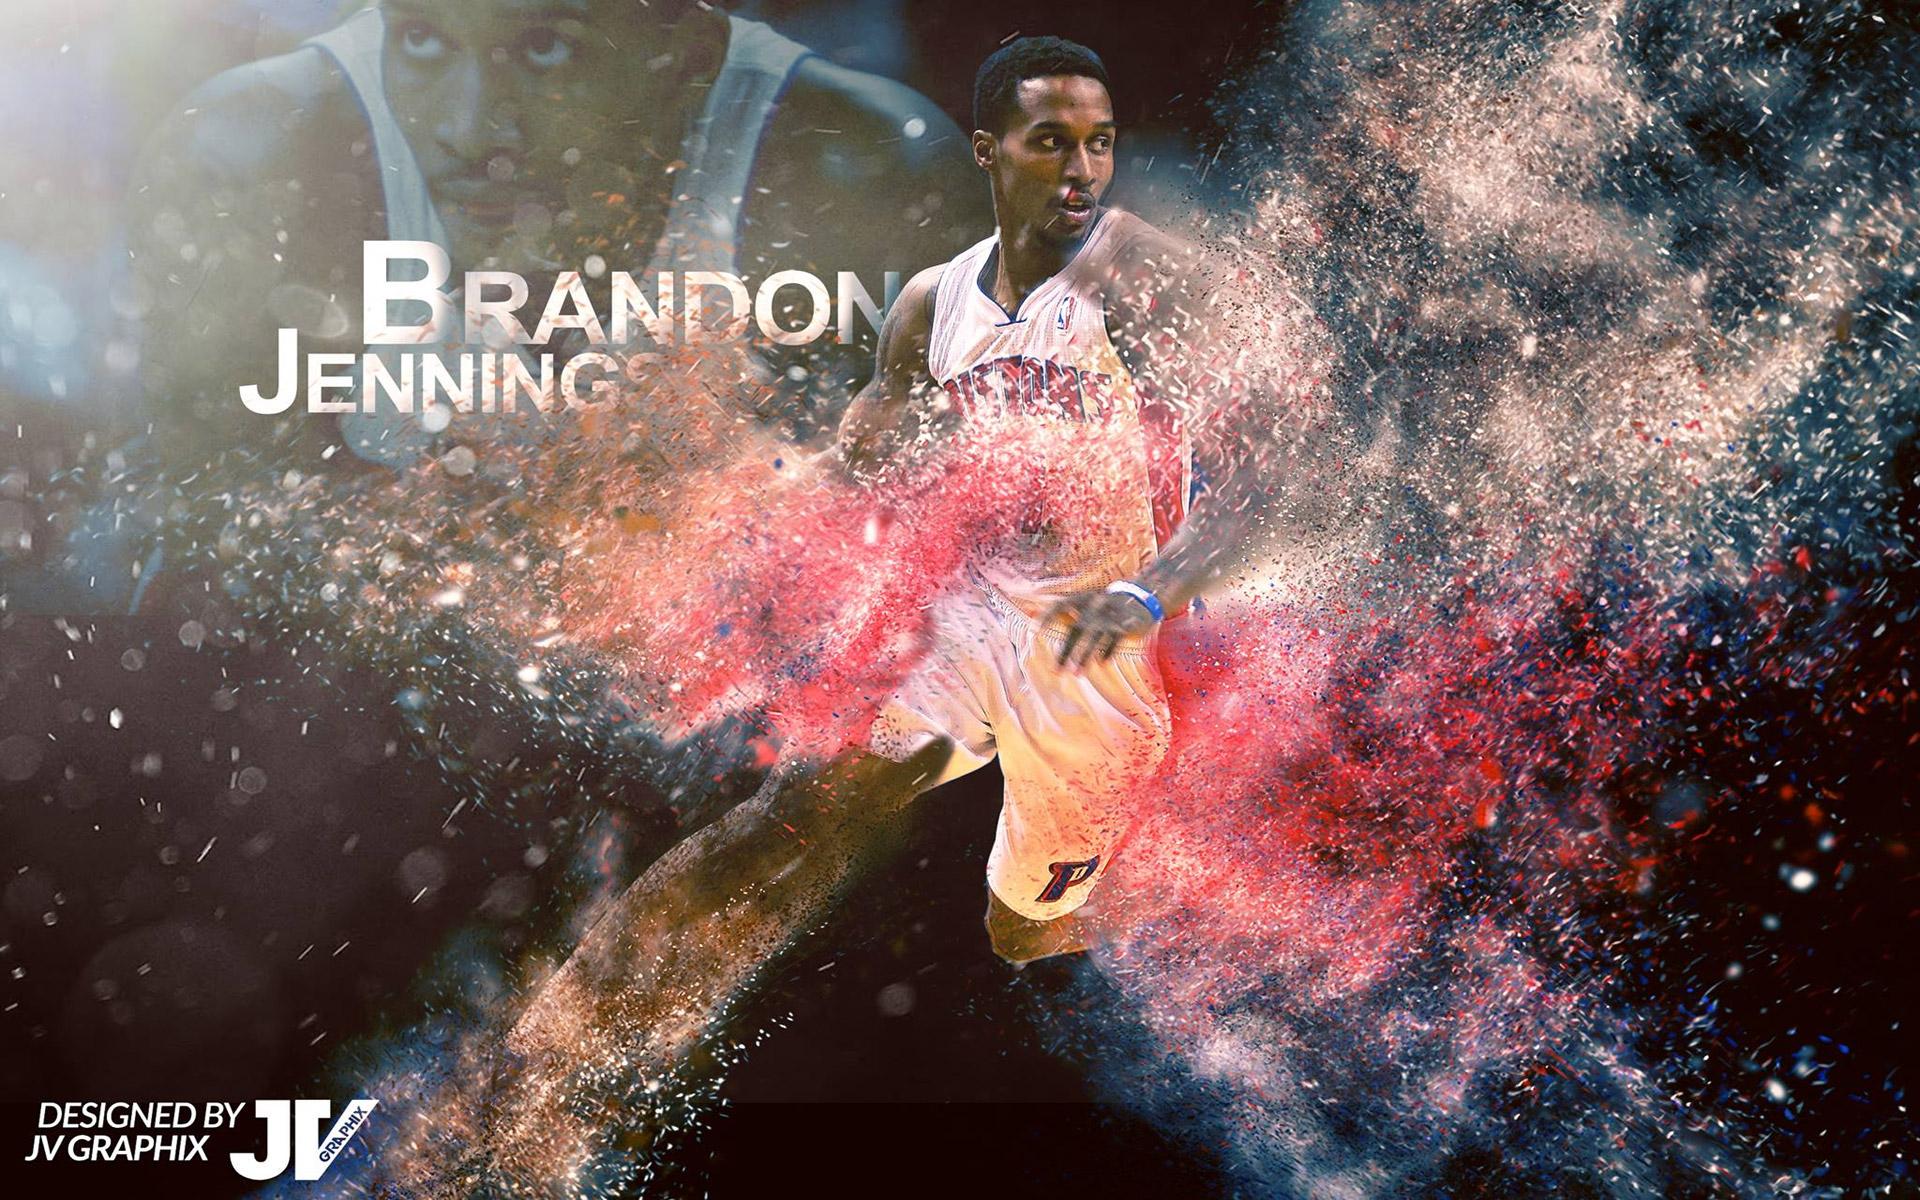 Brandon Jennings Pistons 2016 1920x1200 Wallpaper